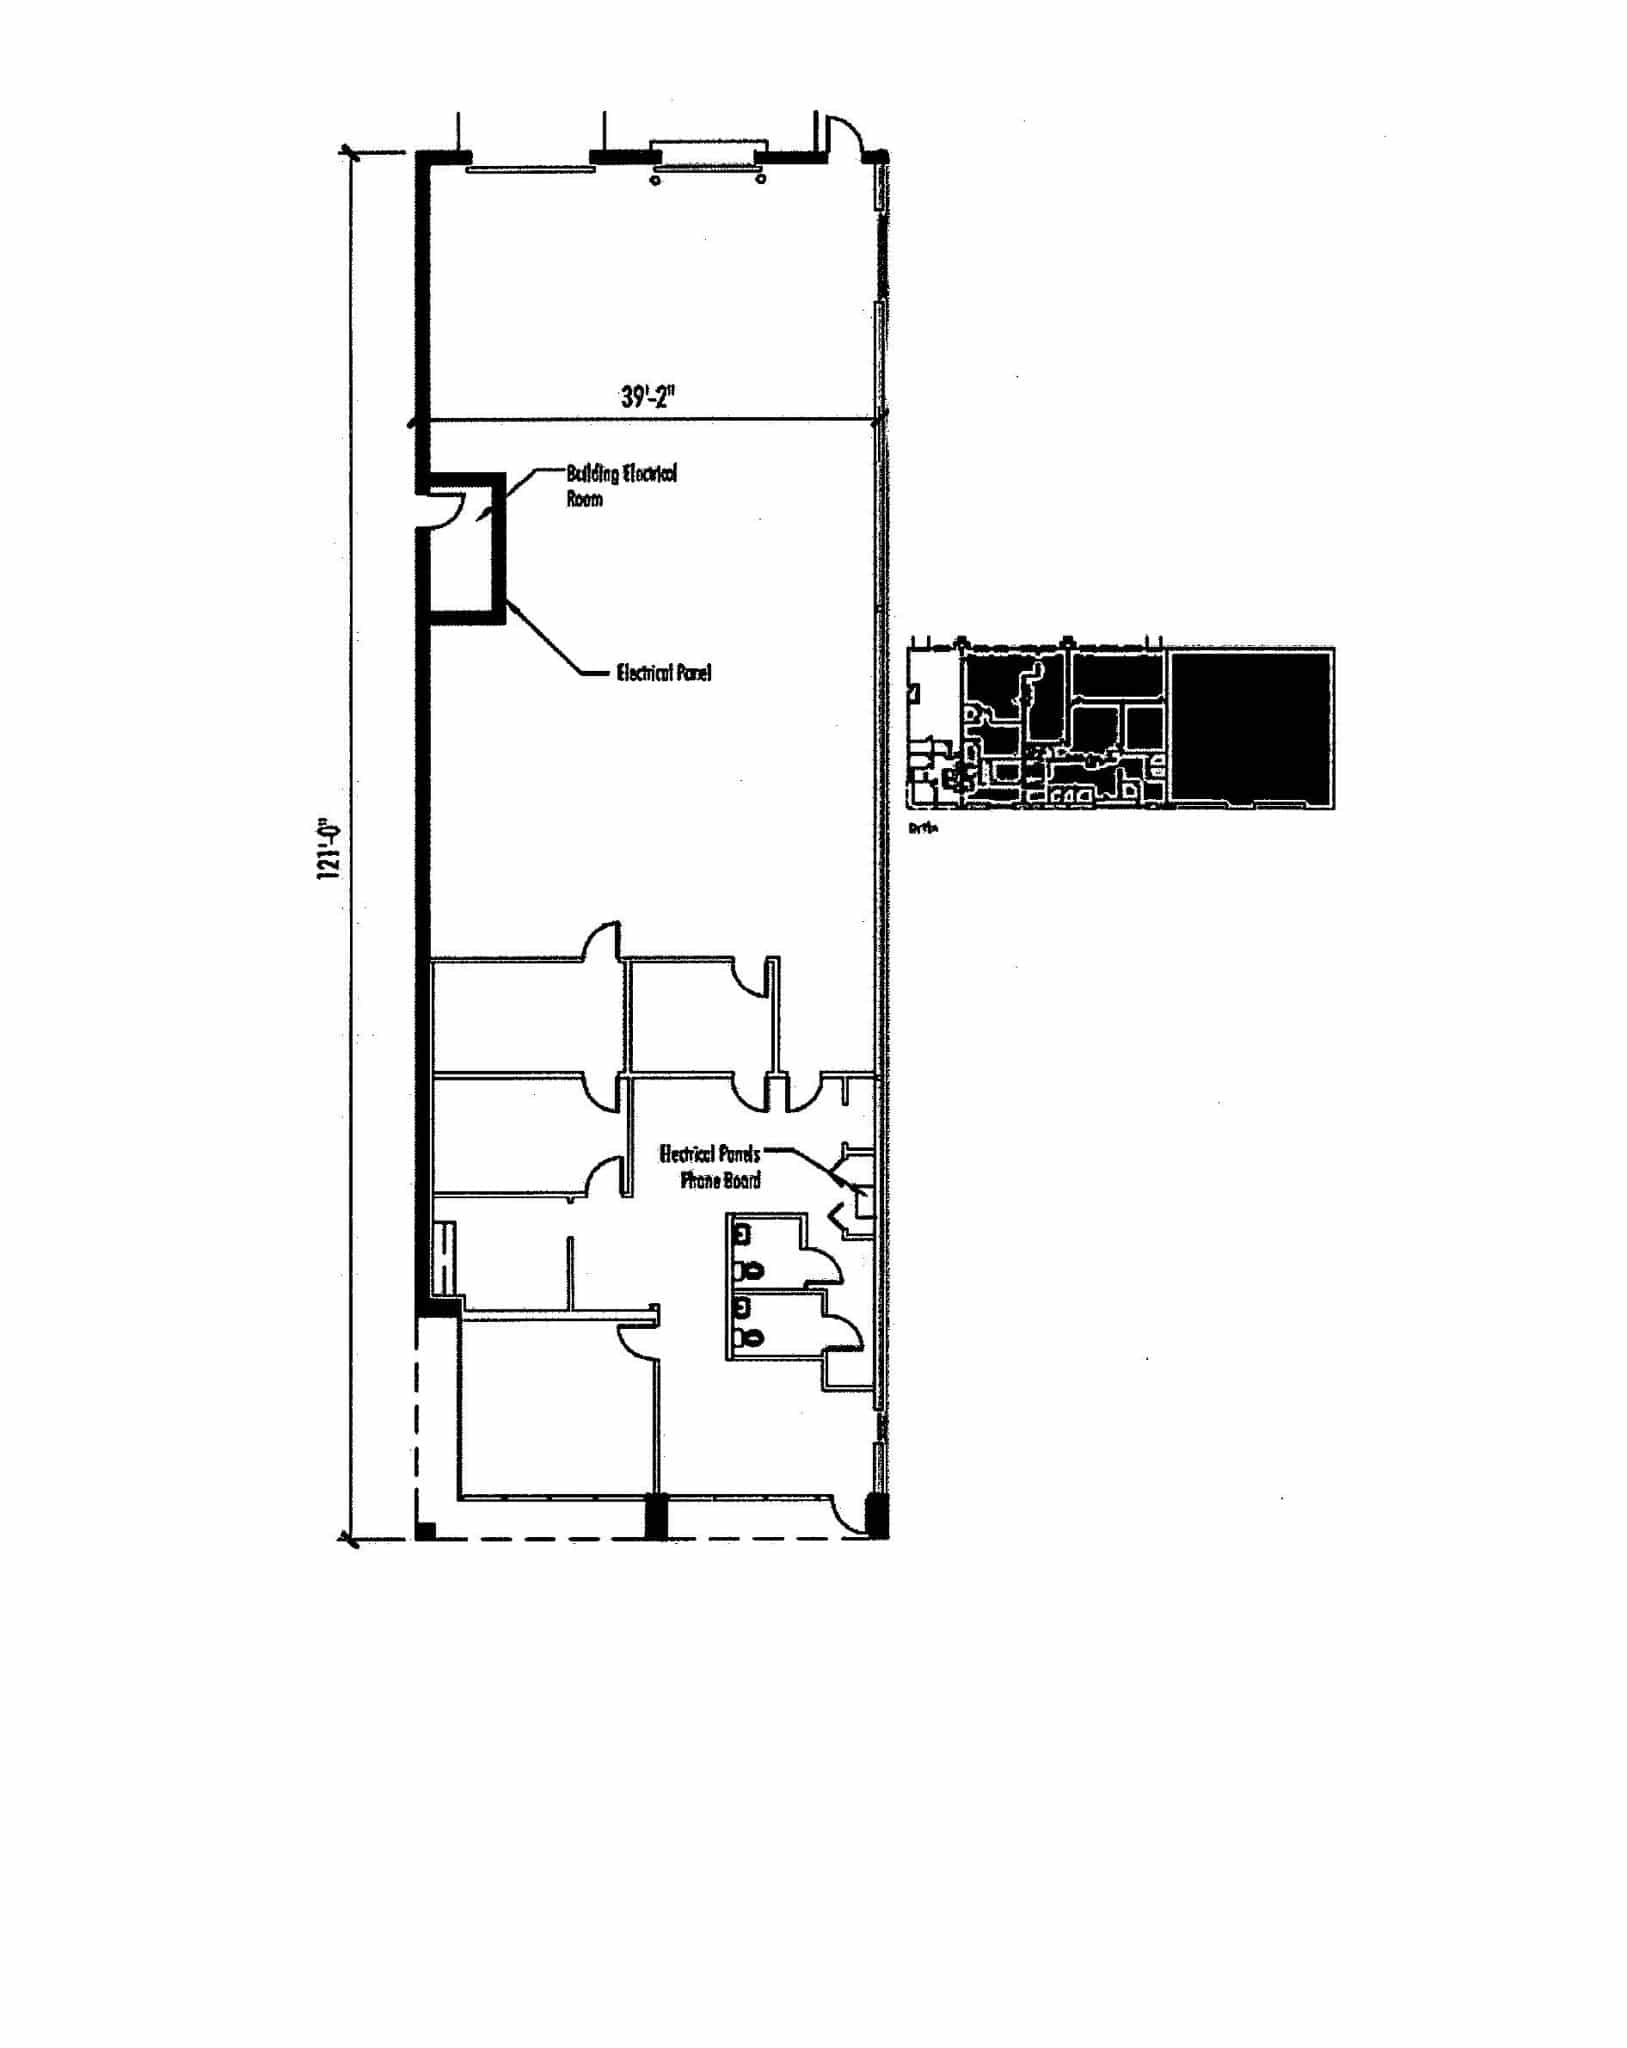 Suite 1007-E